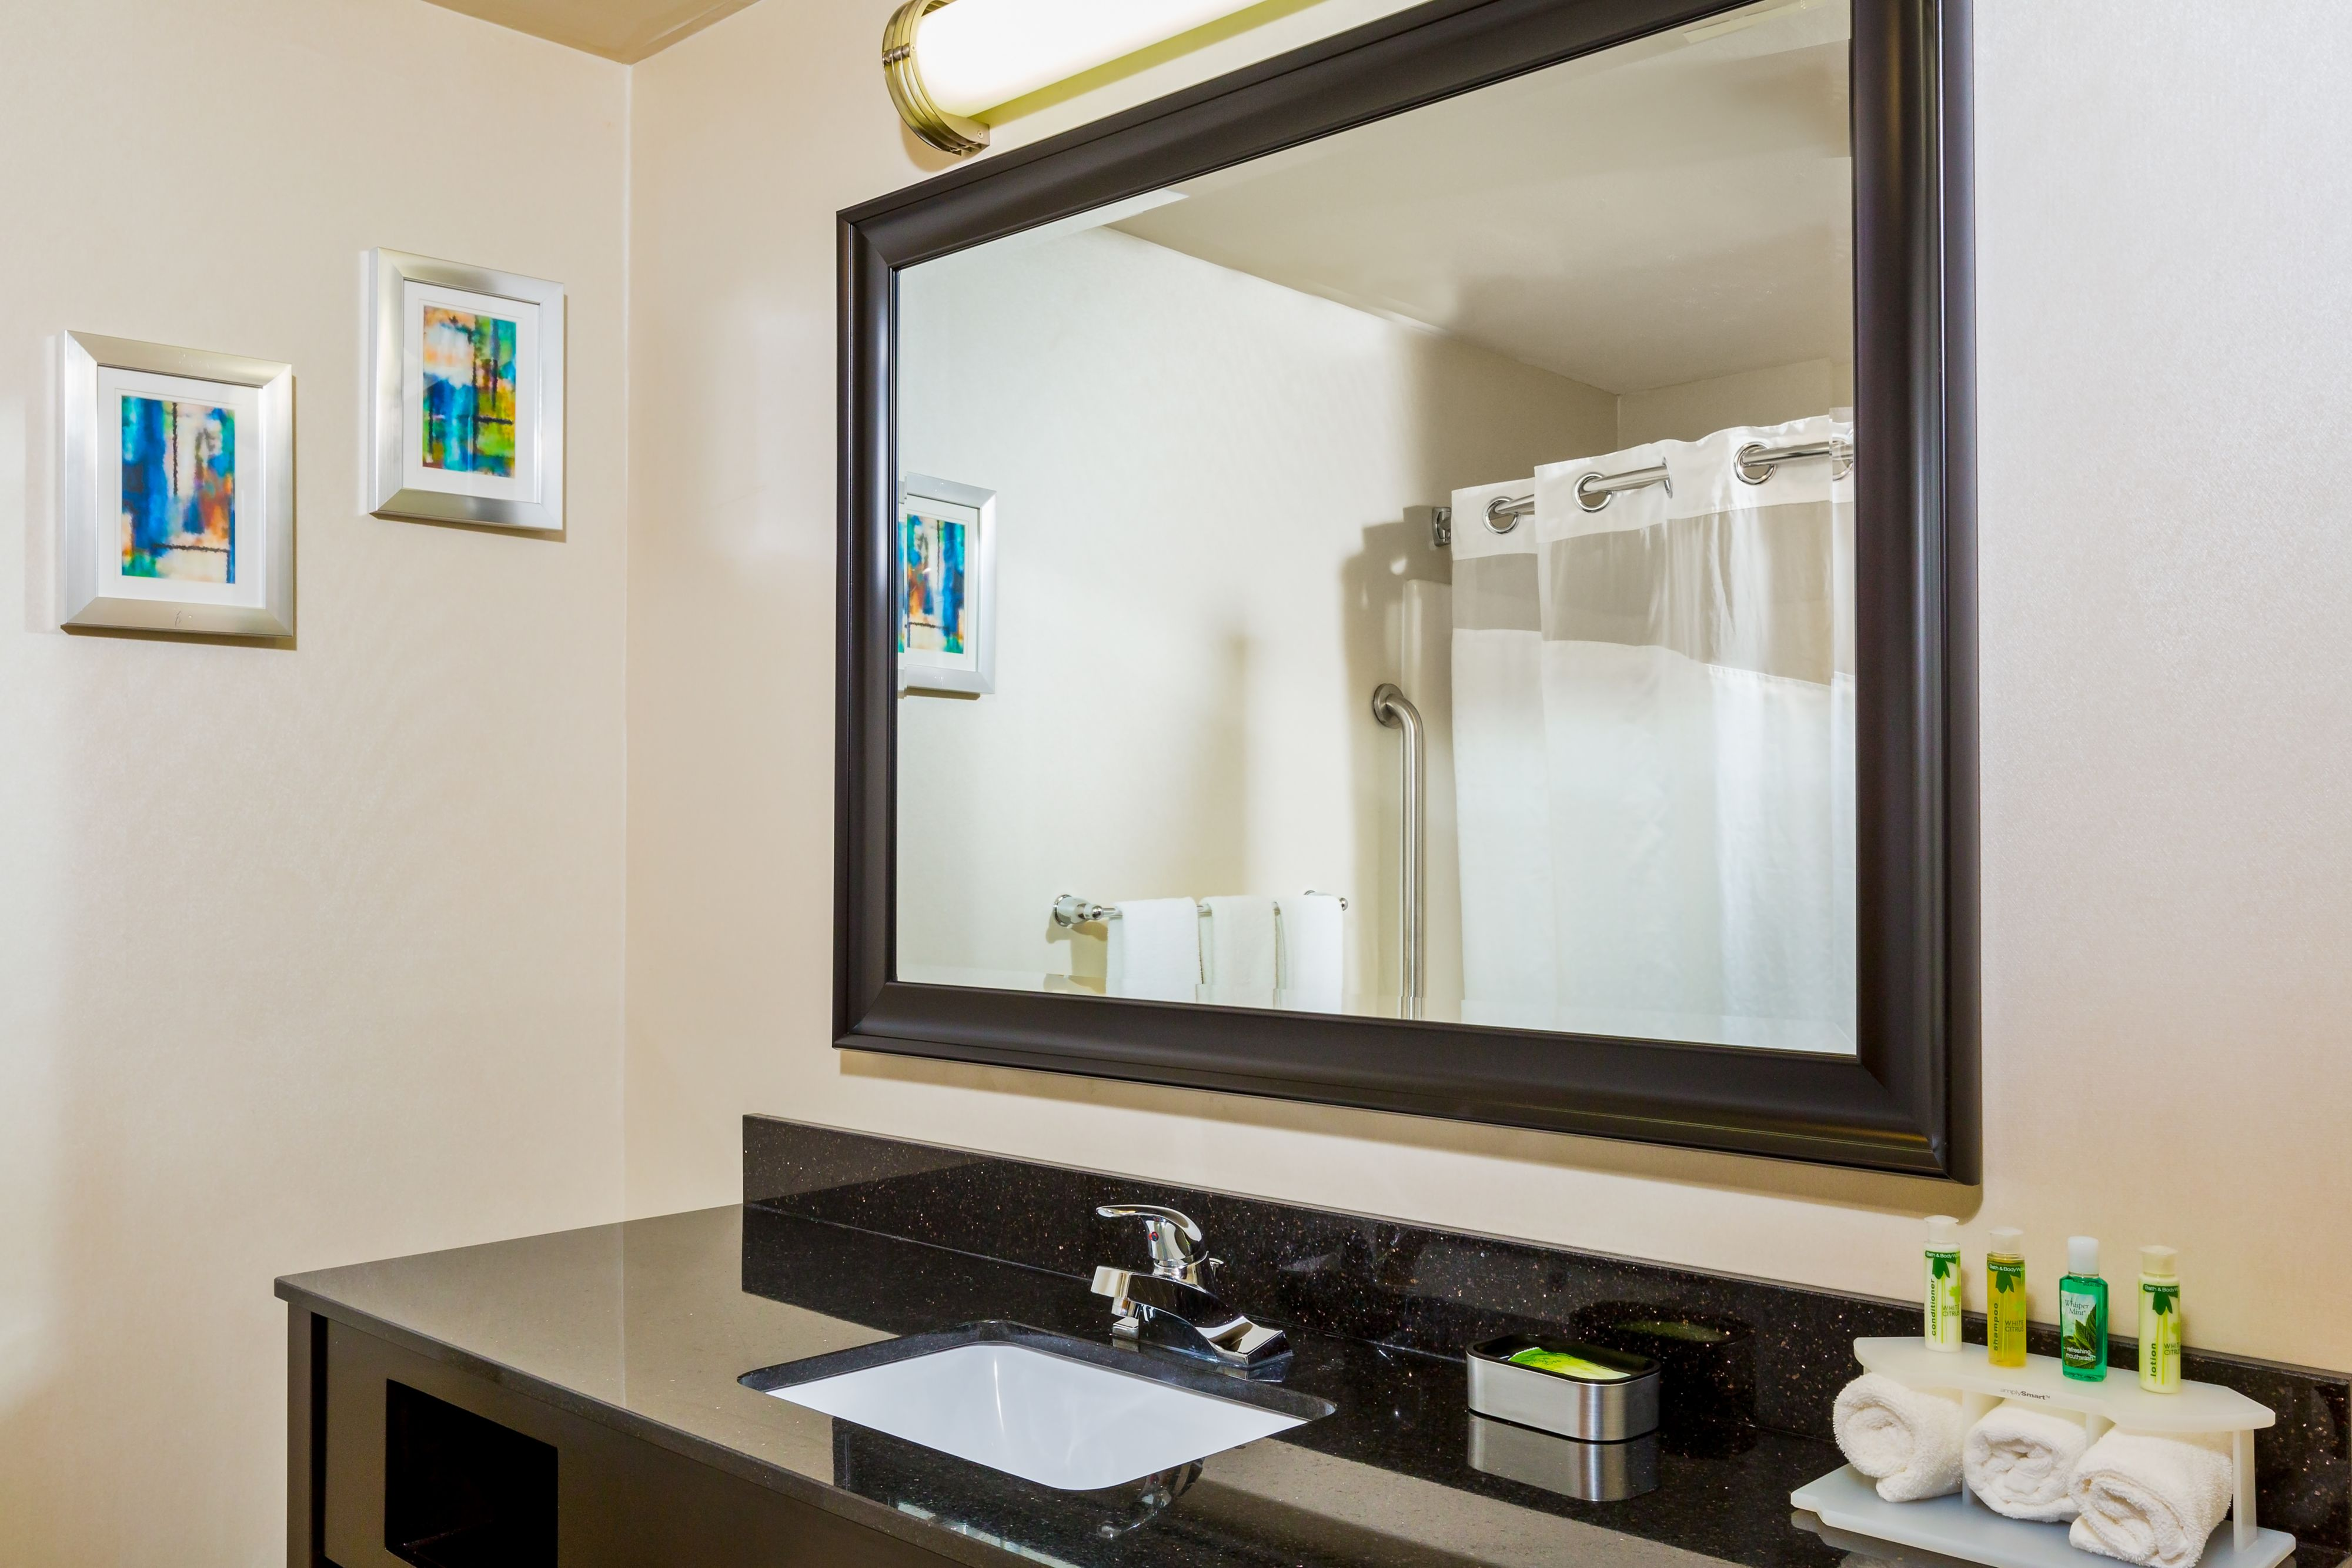 holiday-inn-express-and-suites-westampton-2893255374-original.jpg